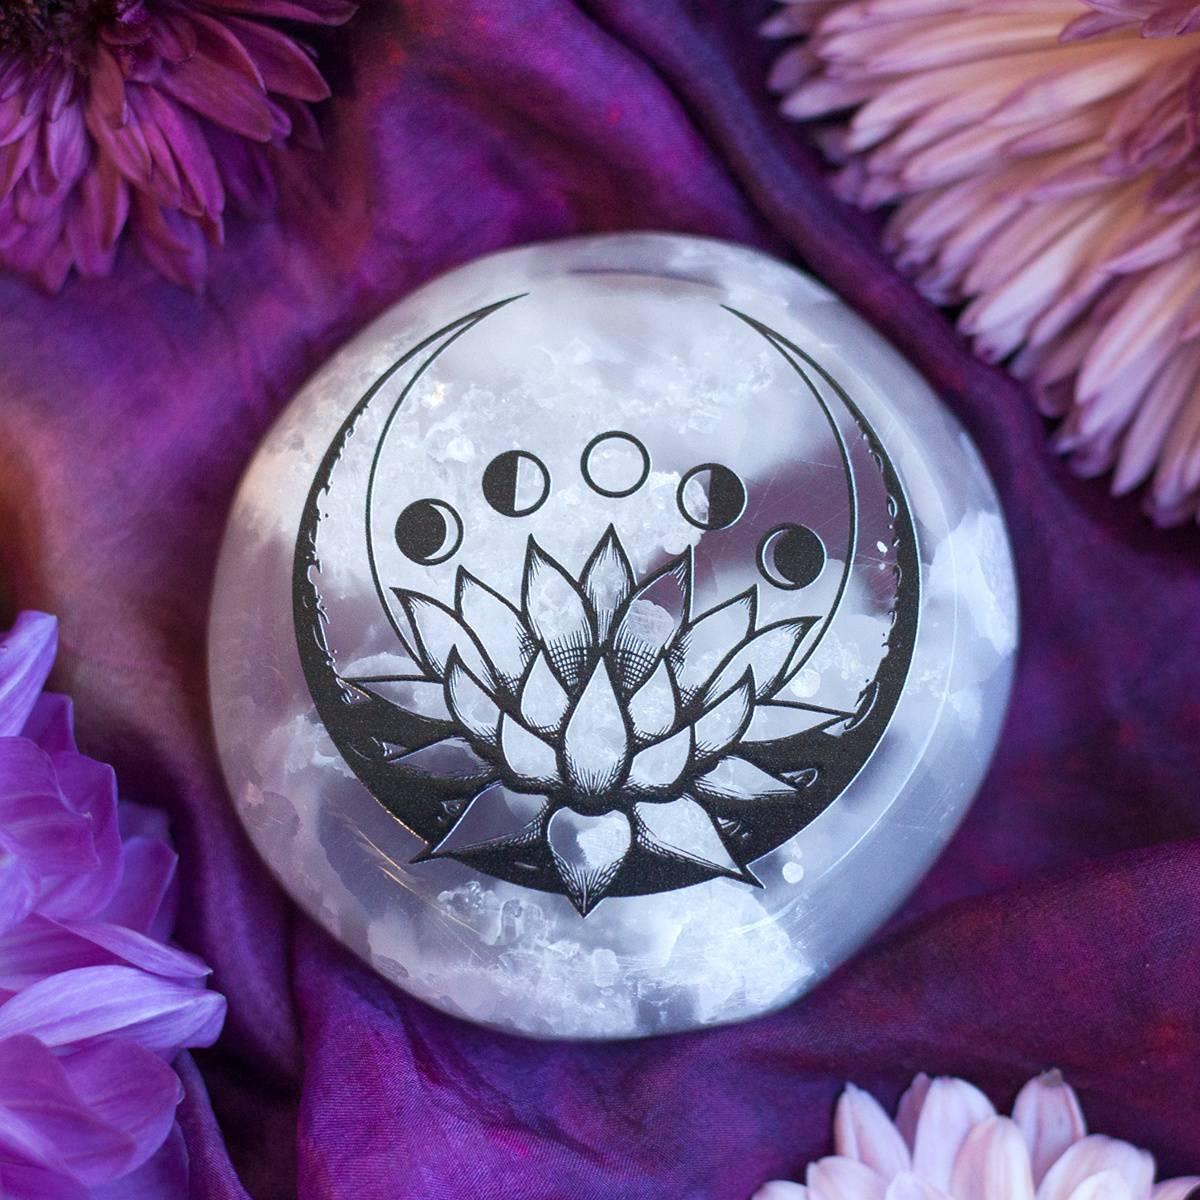 Lotus moon phase printed selenite for clarity and peace during all lotus moon phase printed selenite 223 izmirmasajfo